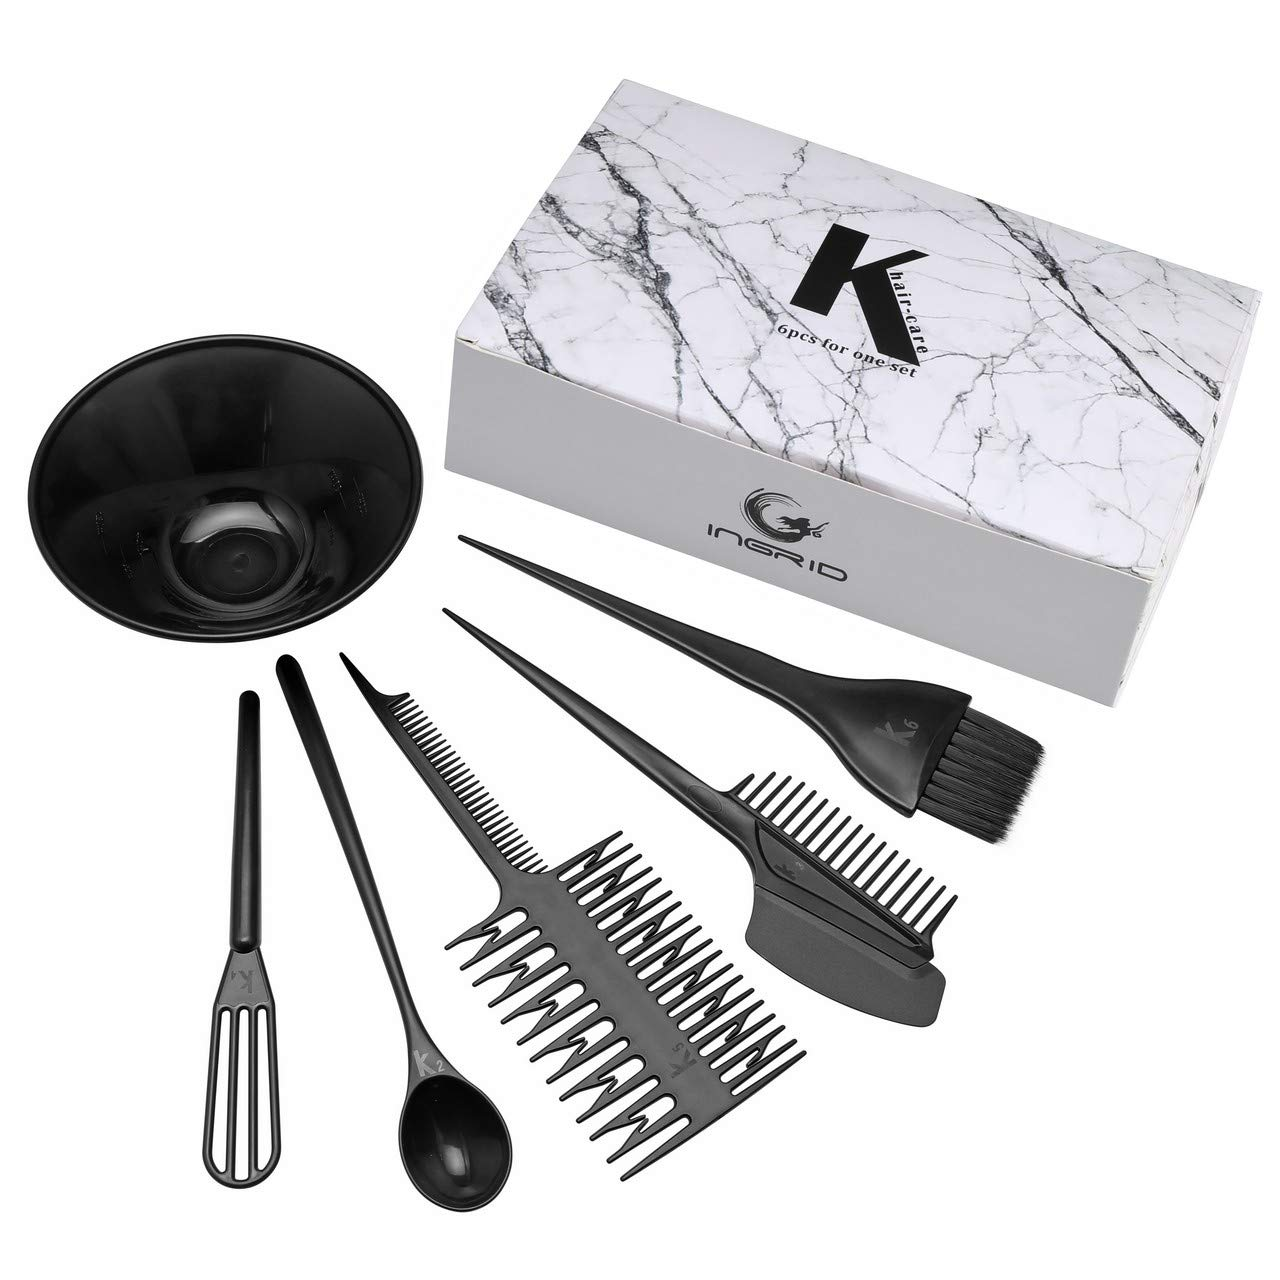 FALETO Hair Dye Set Kit Professional Hairdressing Brush Comb Bowl Hair Color Dye Tint DIY Tool Set Kit(Set of 6) by FALETO